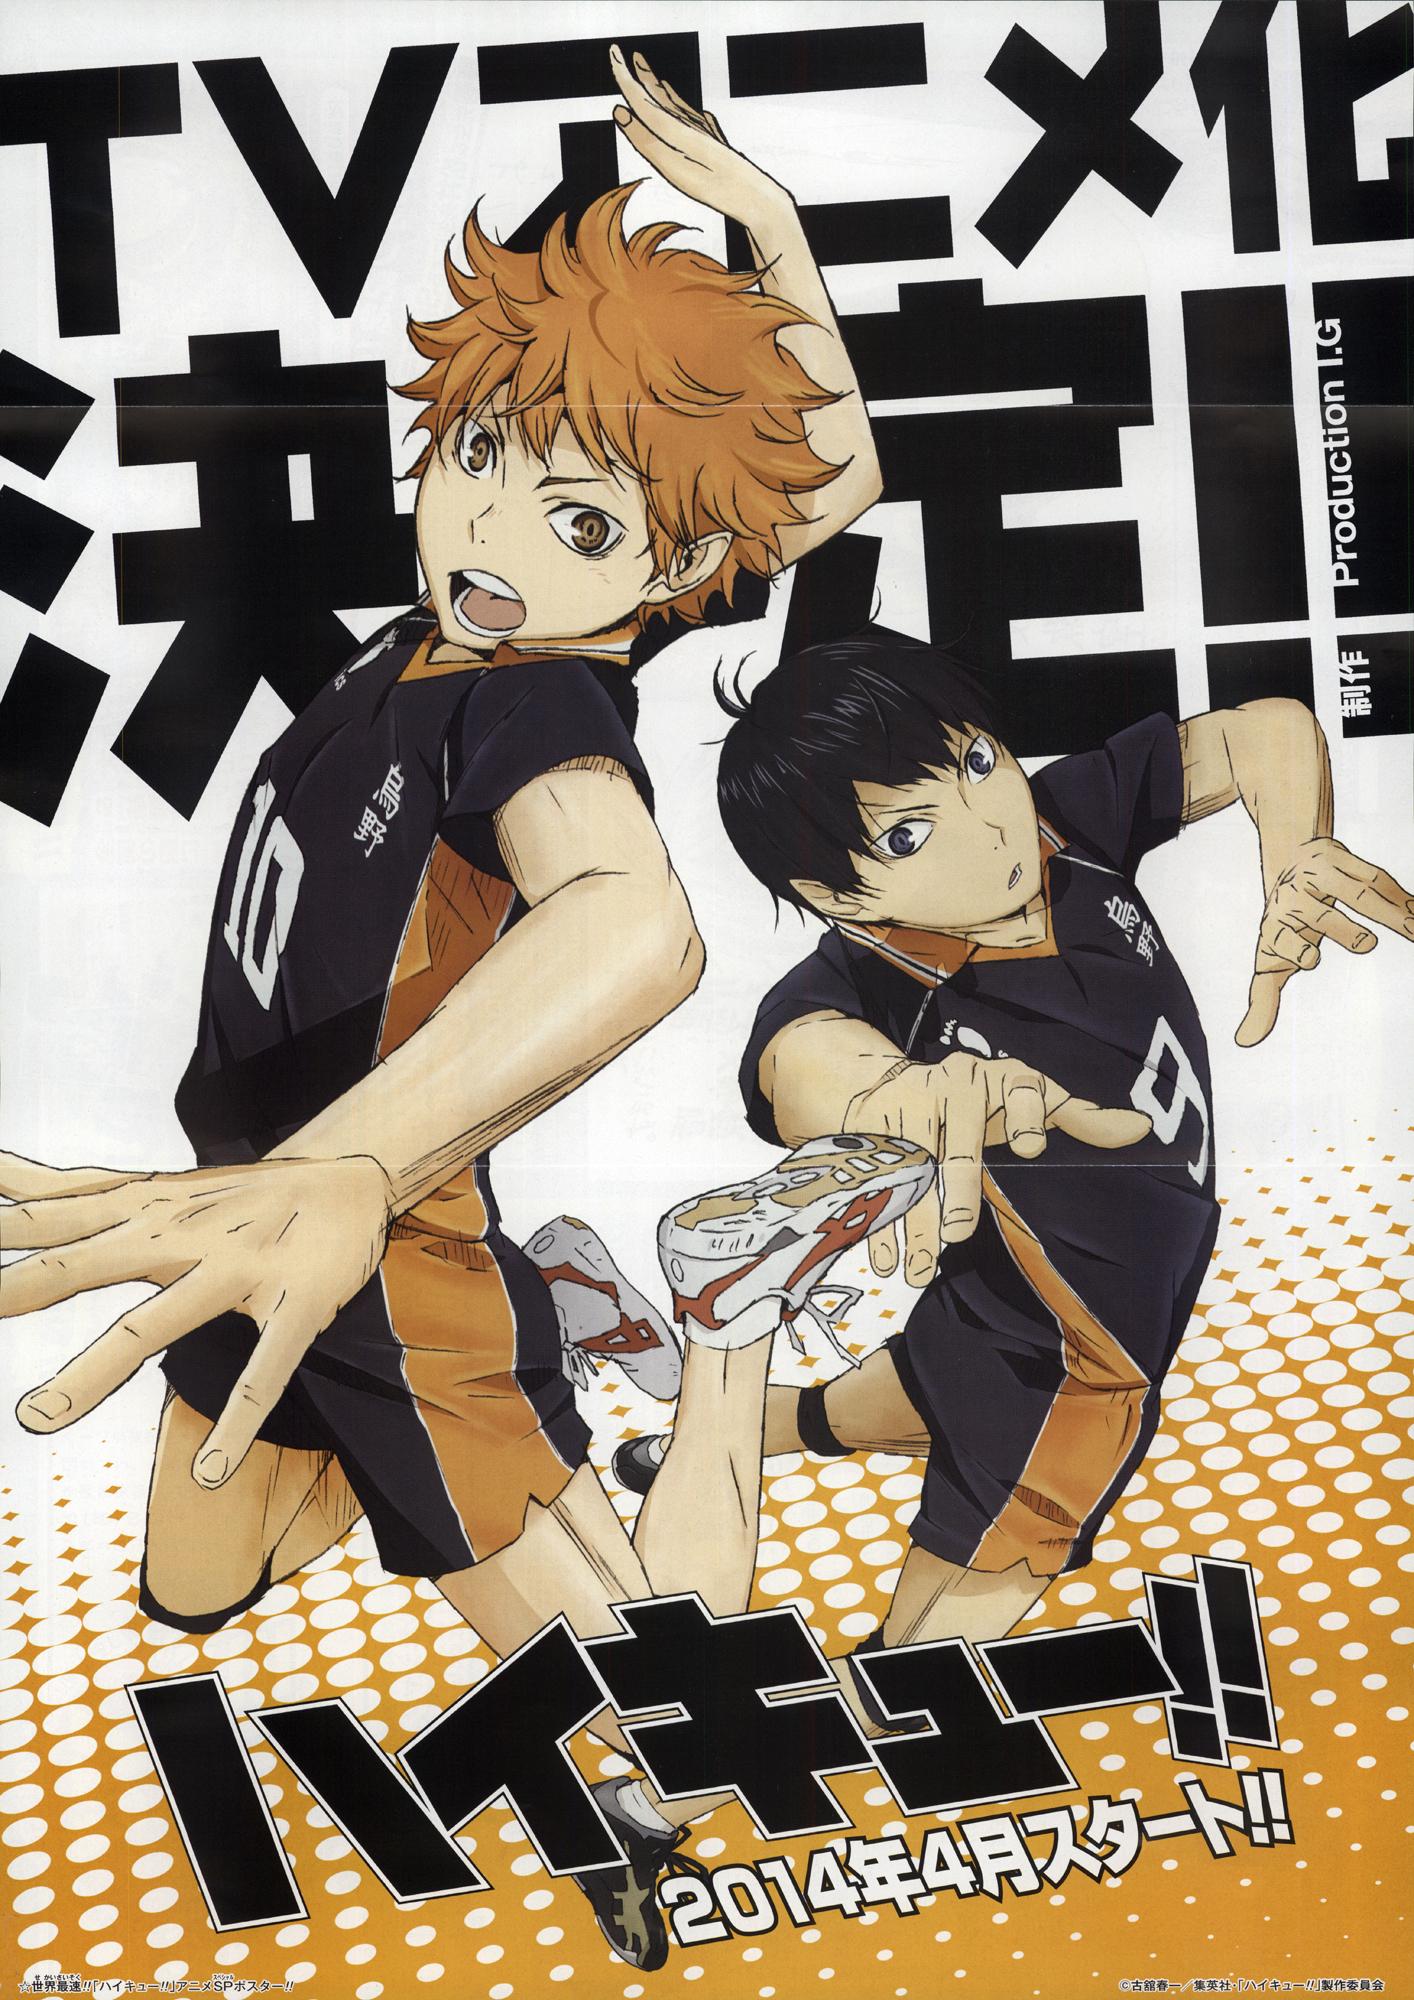 Visuel clé de l'anime Haikyuu!!